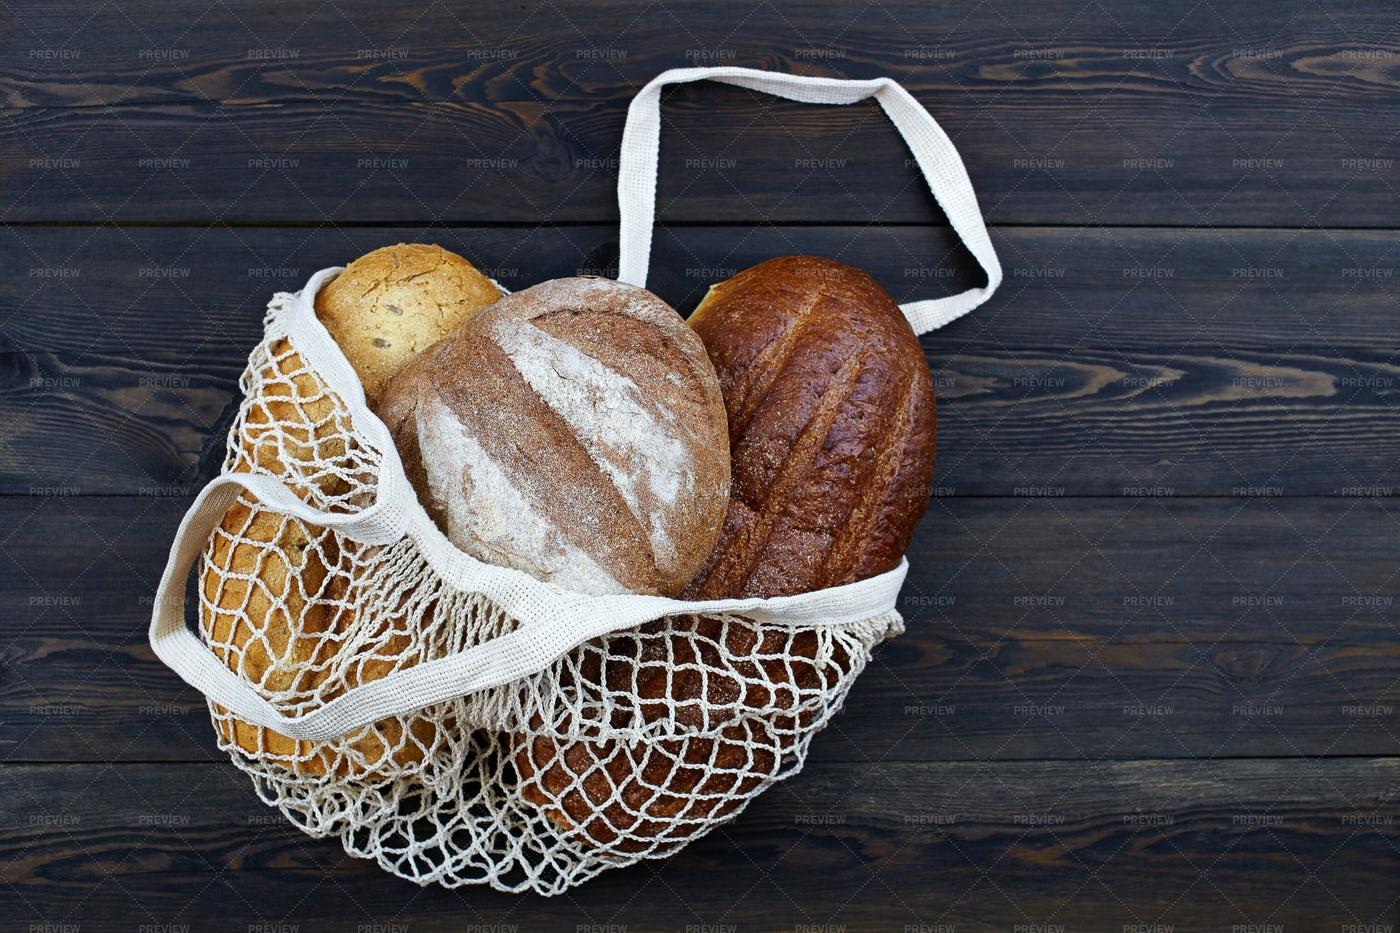 String Bag Of A Bread Assortment: Stock Photos